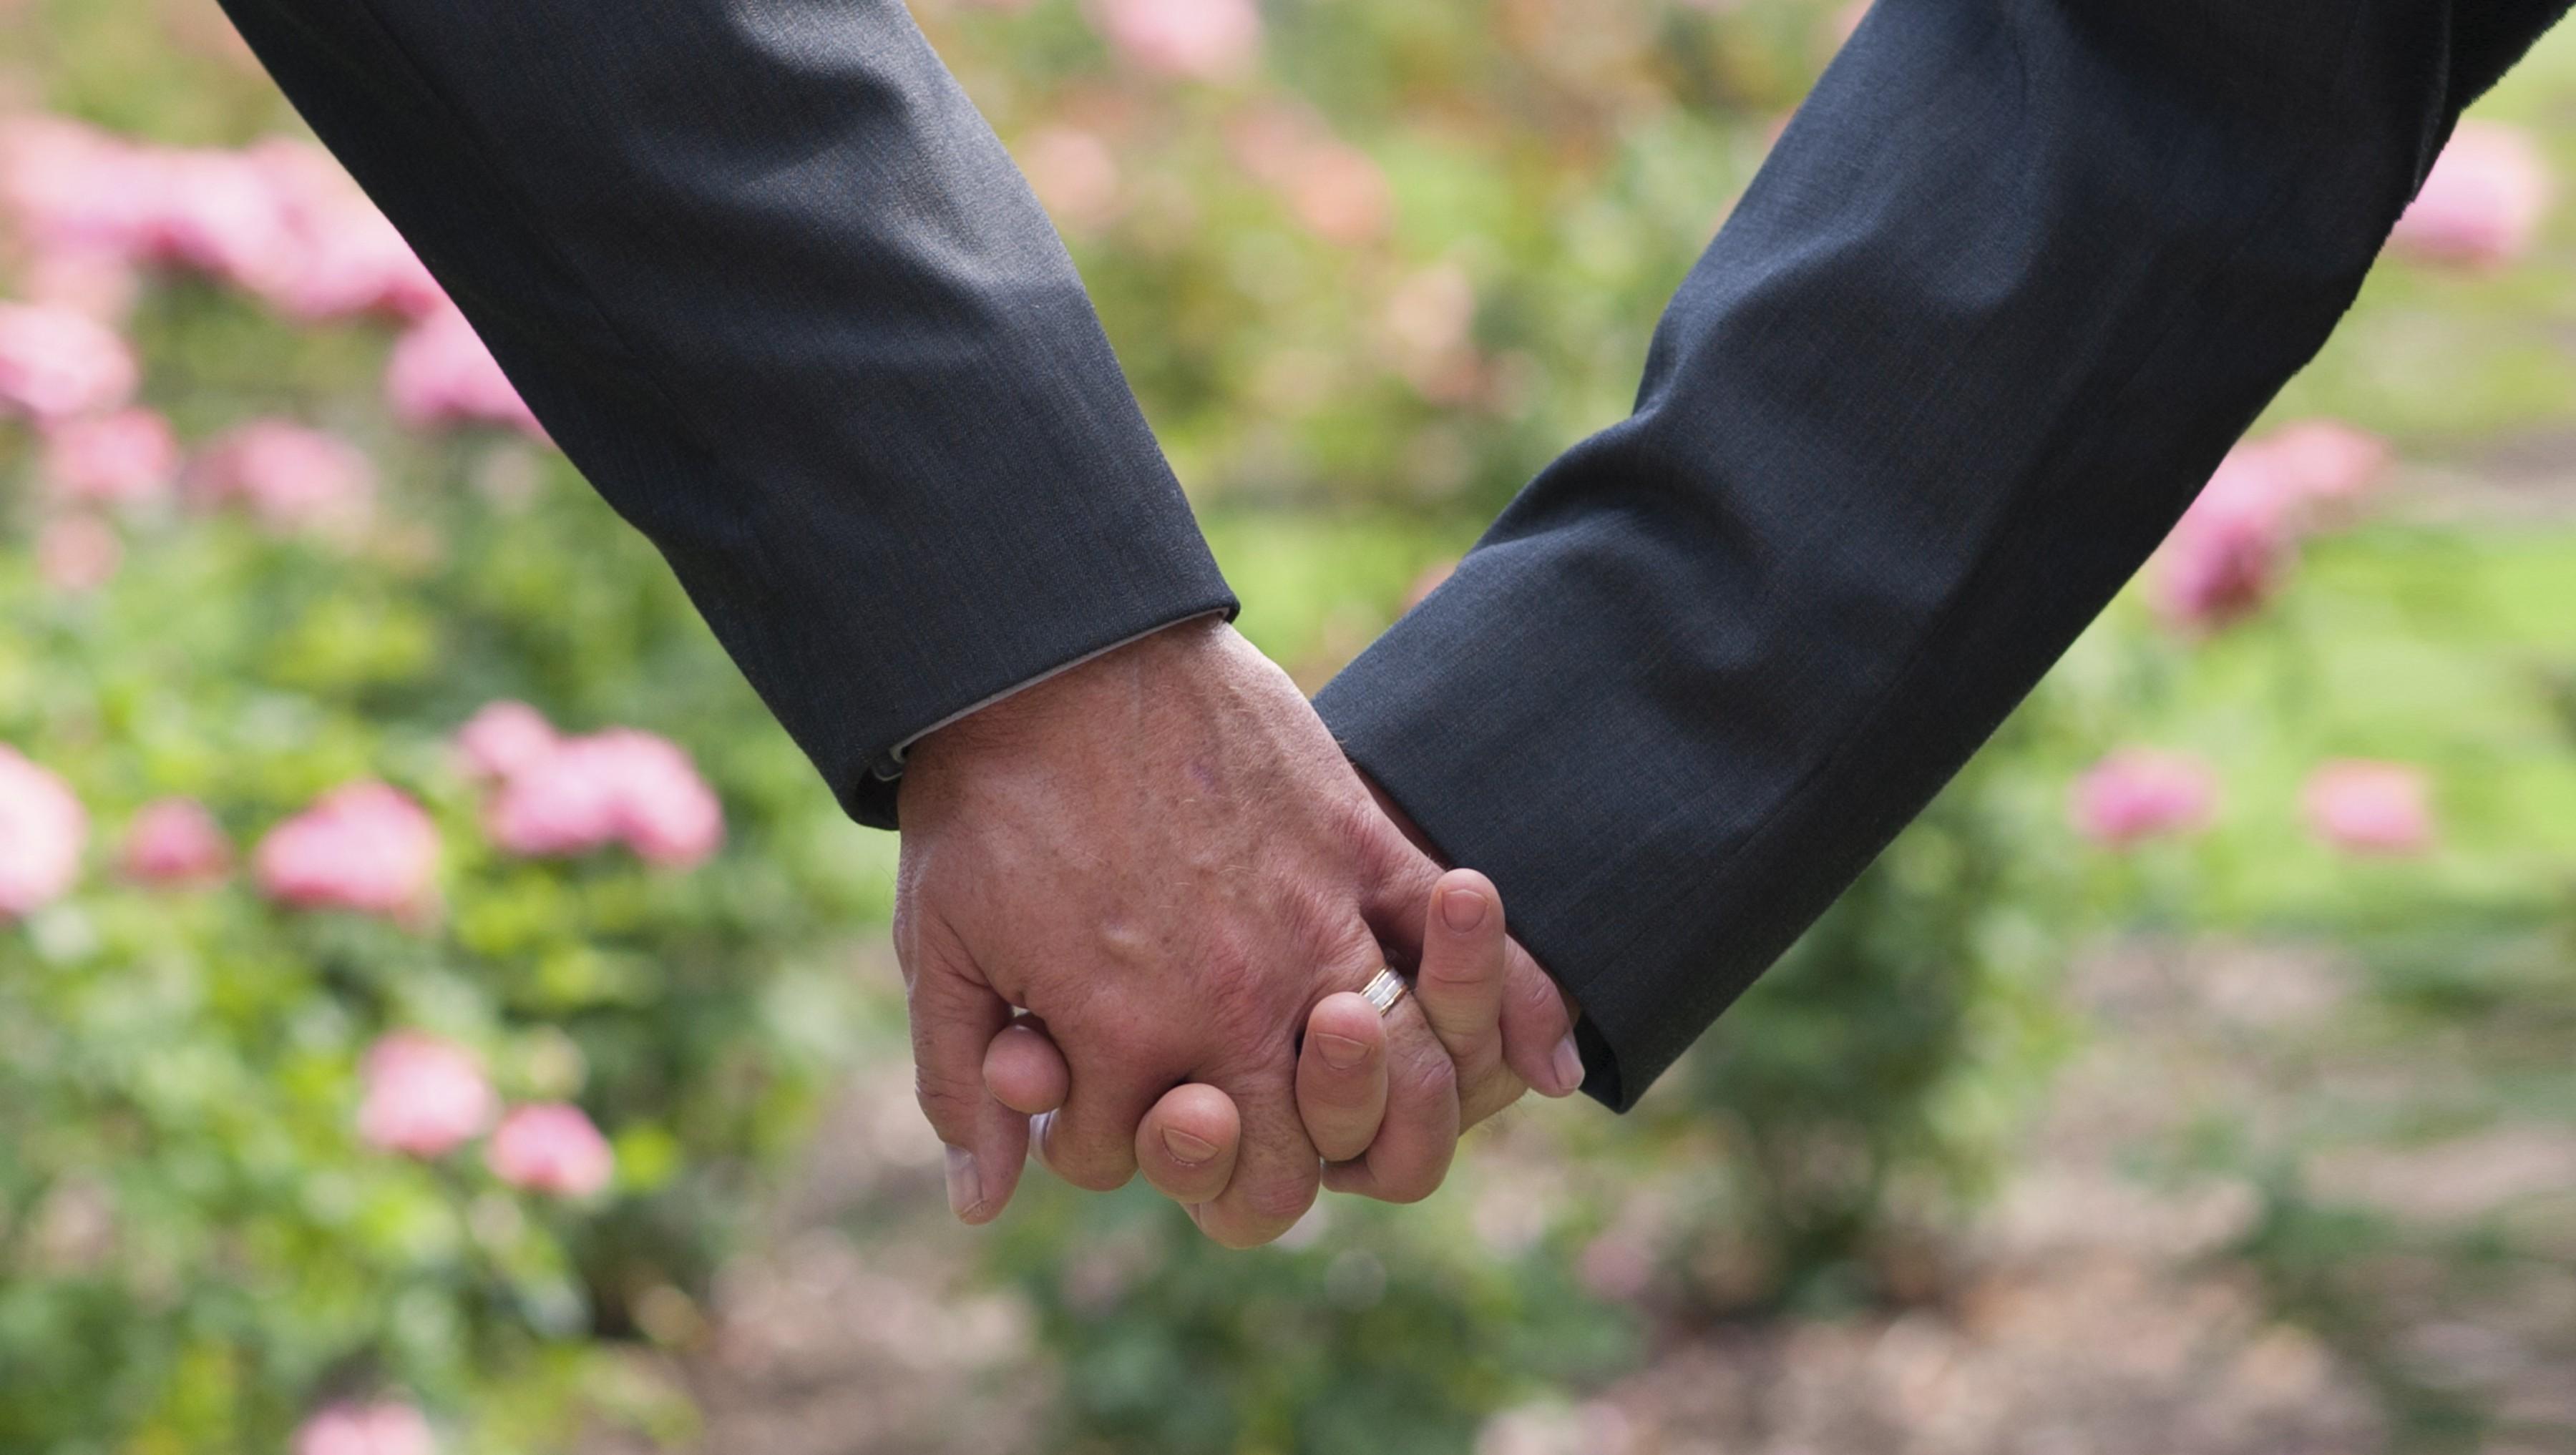 Here's the next gay marriage debate